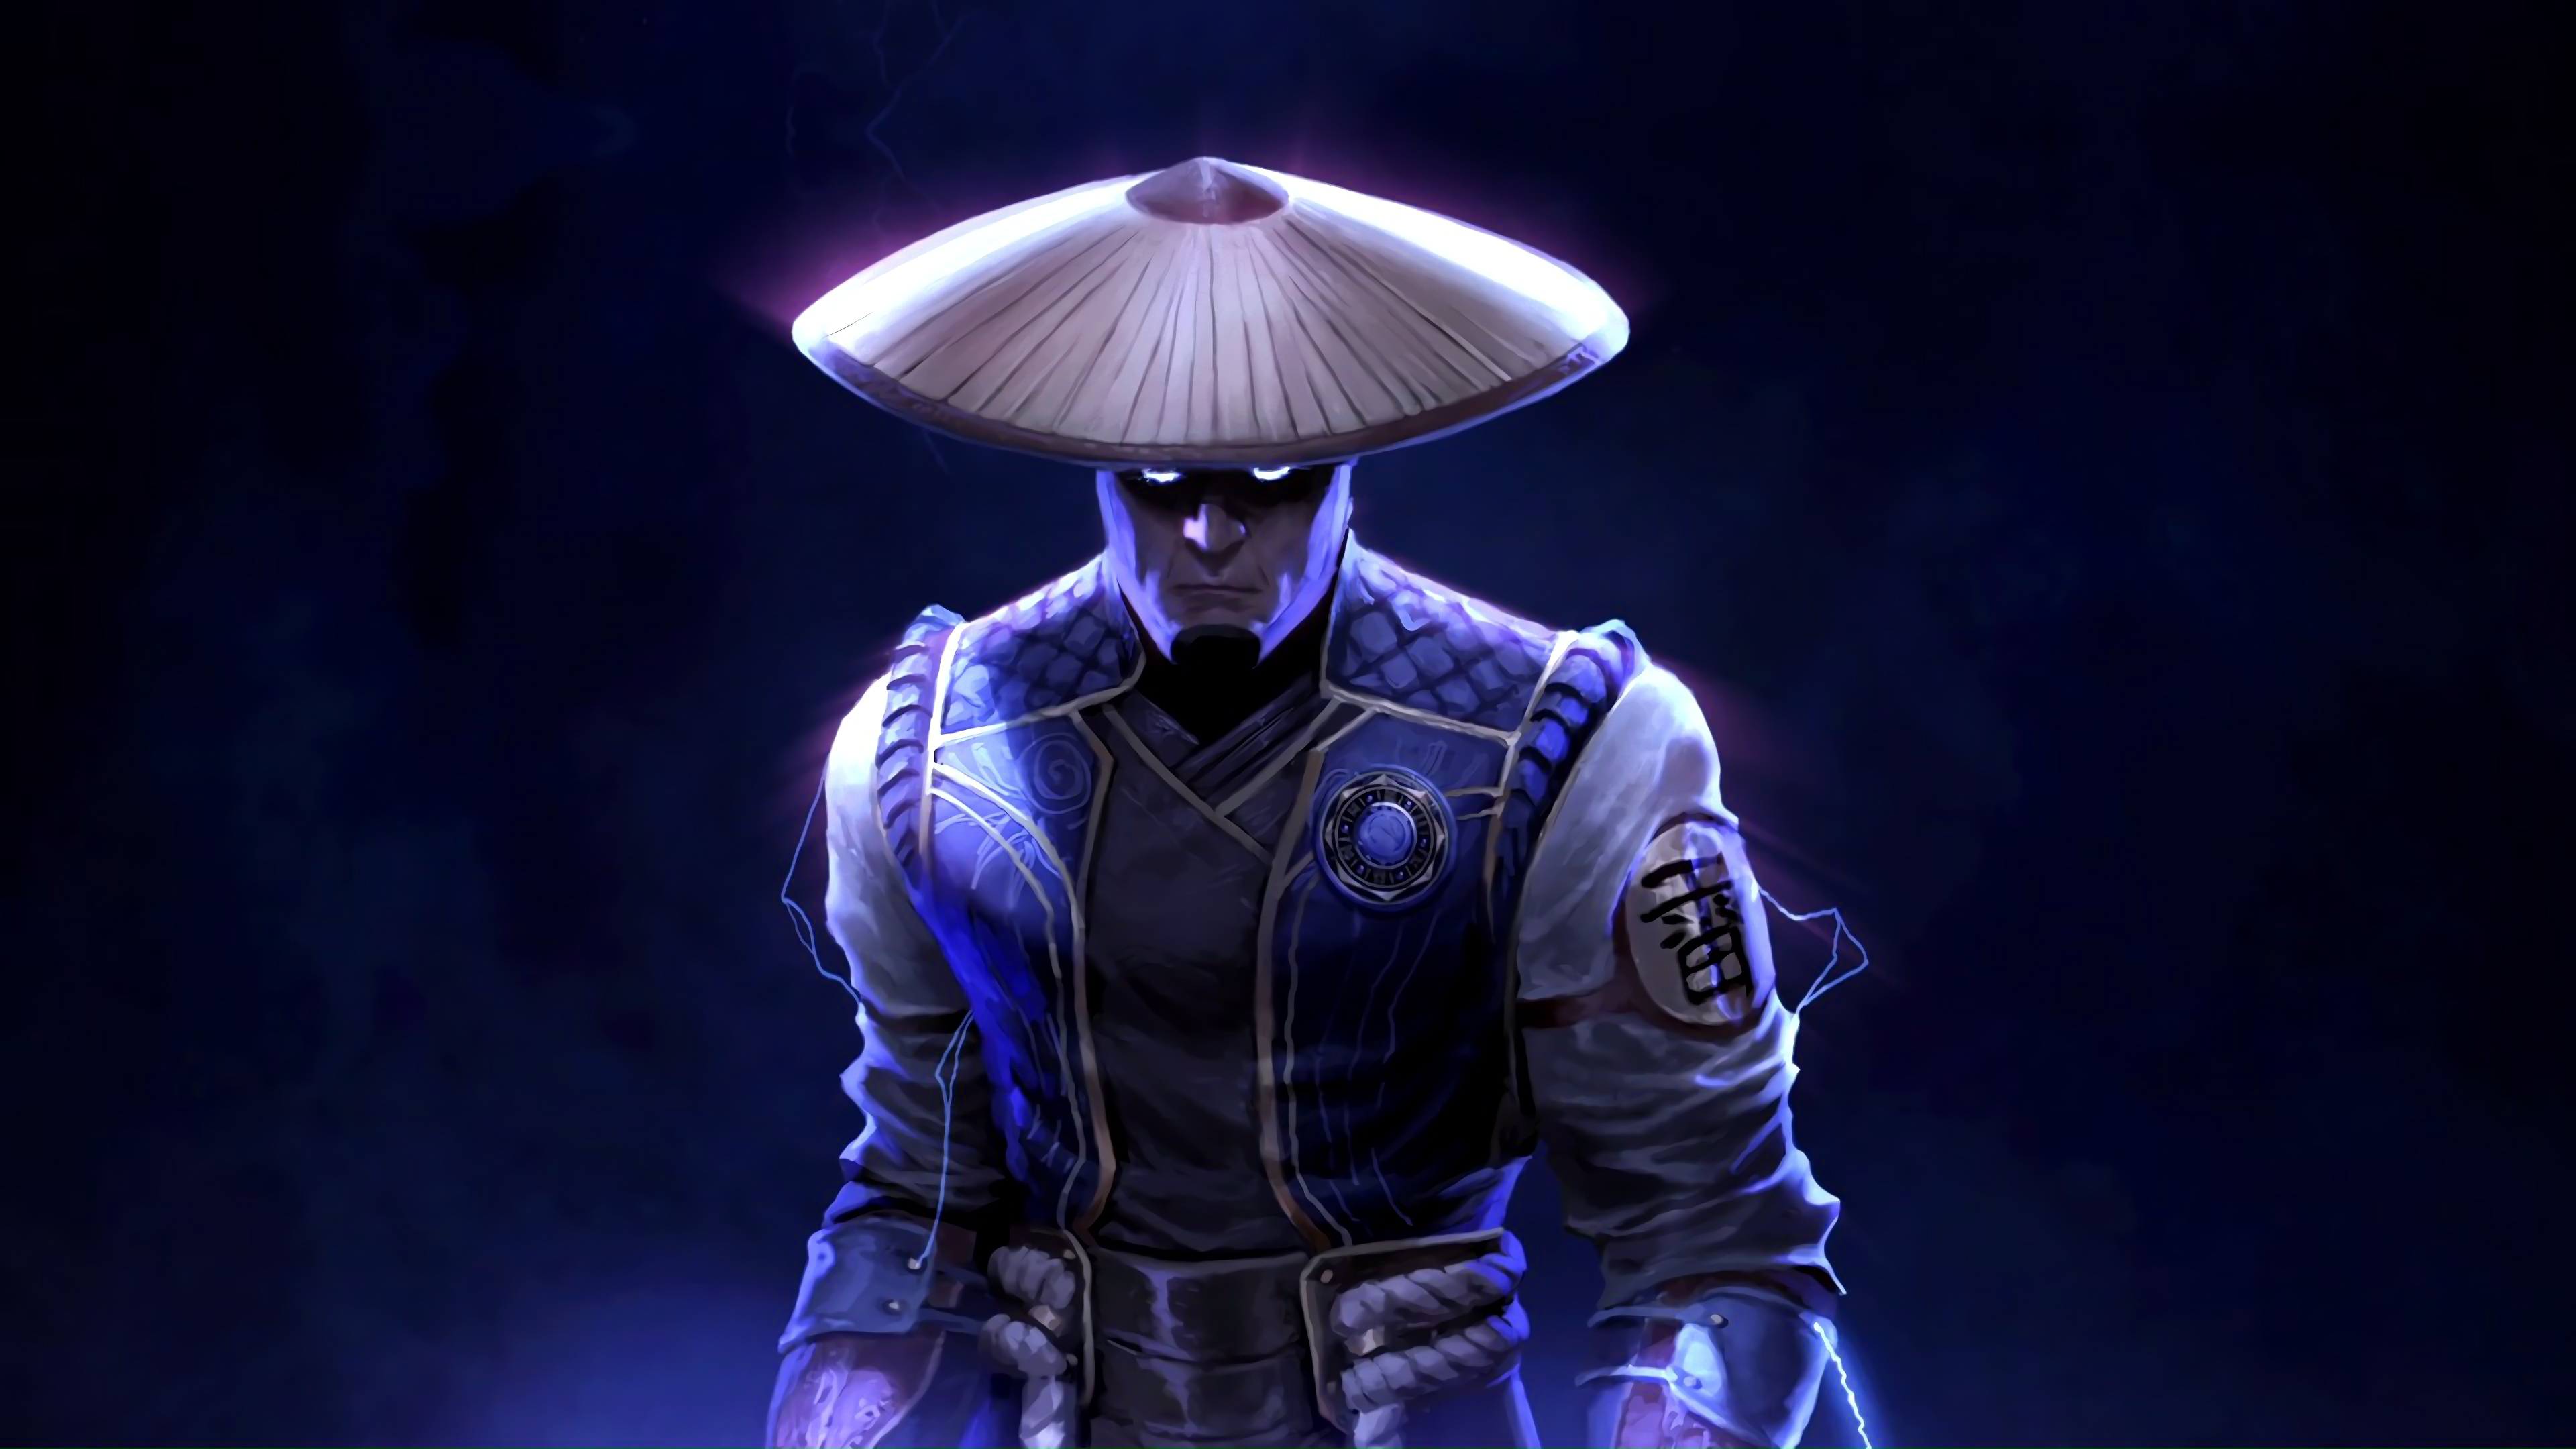 Frost, Mortal Kombat 11, 4K, #266 Wallpaper